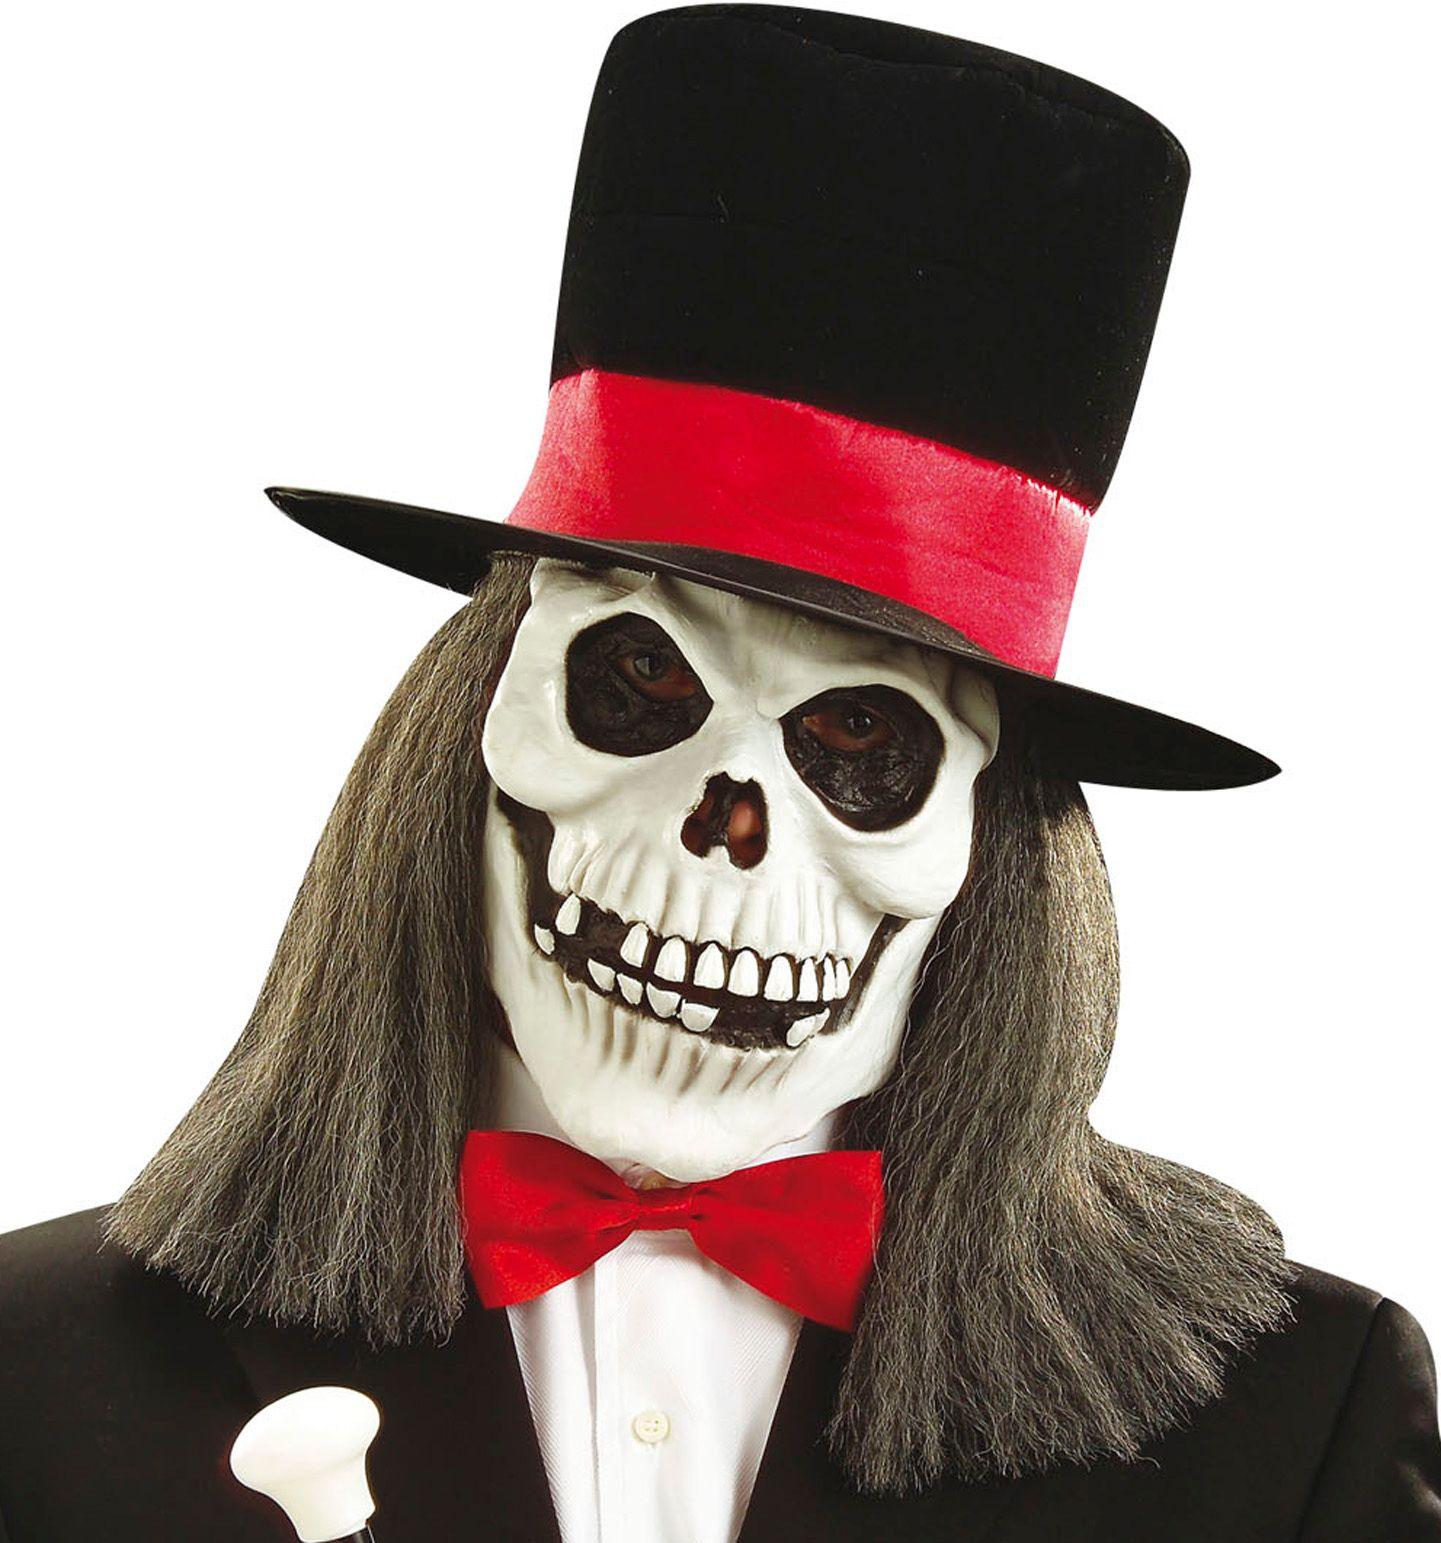 Schedel masker met pruik en hoed